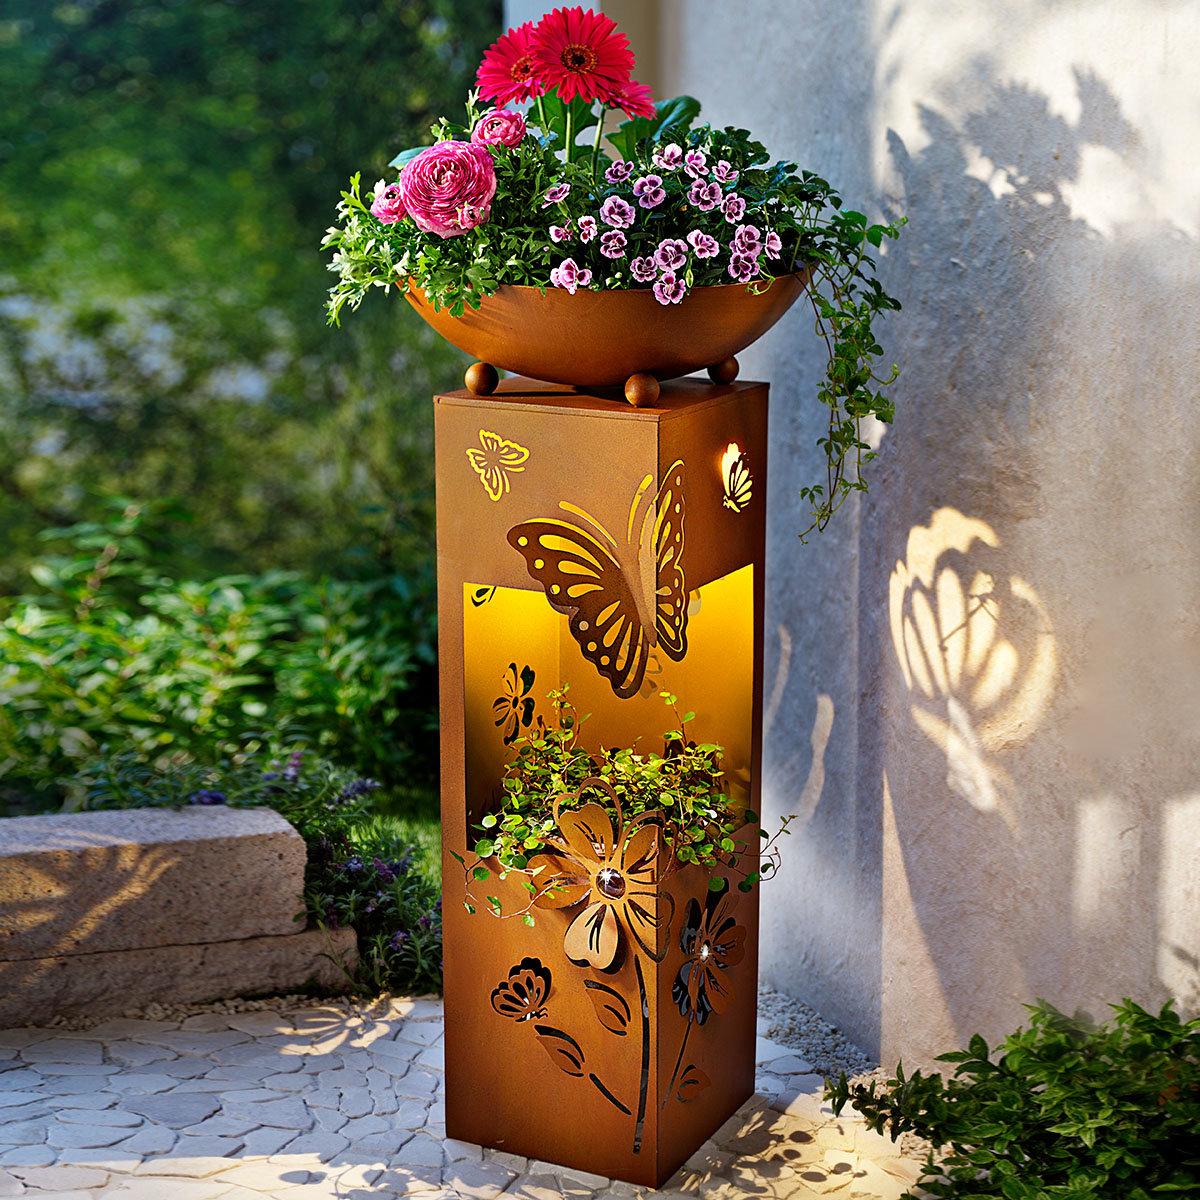 Pflanzsäule Butterfly, mit LED Beleuchtung, 70 cm, Ø 34 cm, rostbraun